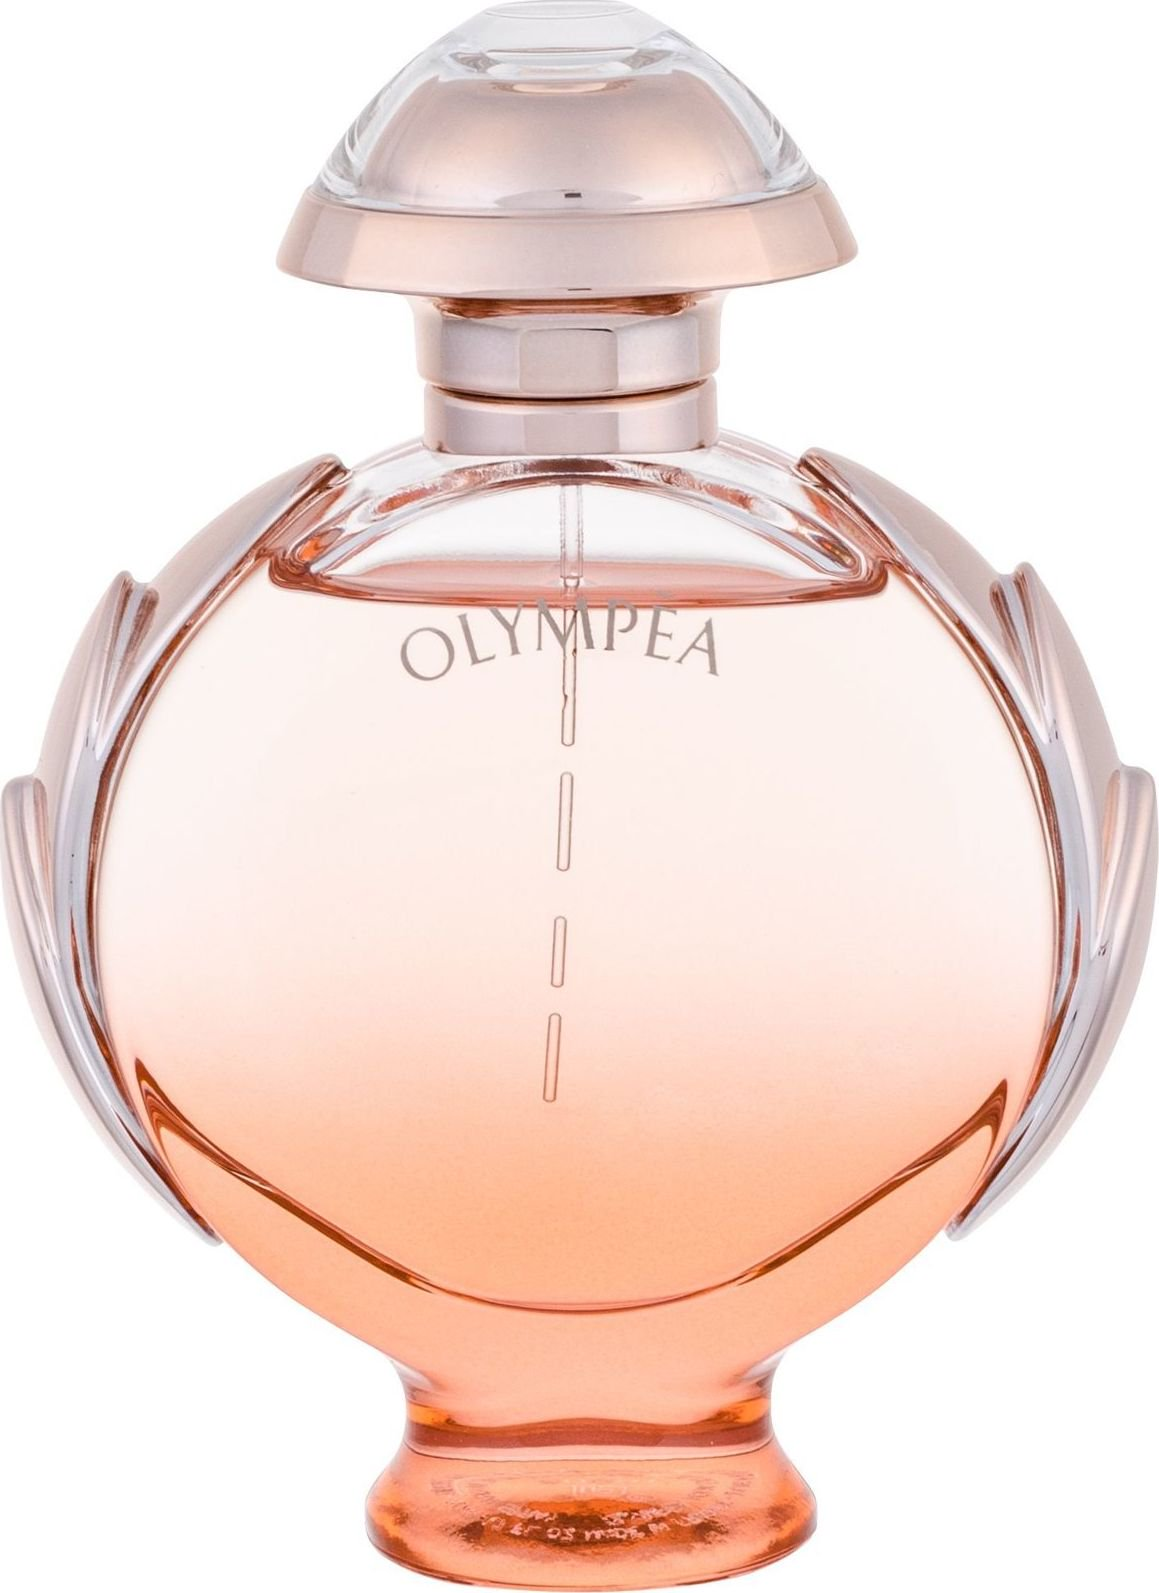 PACO RABANNE Olympea Aqua Legere EDT 50 ml 81223 Smaržas sievietēm